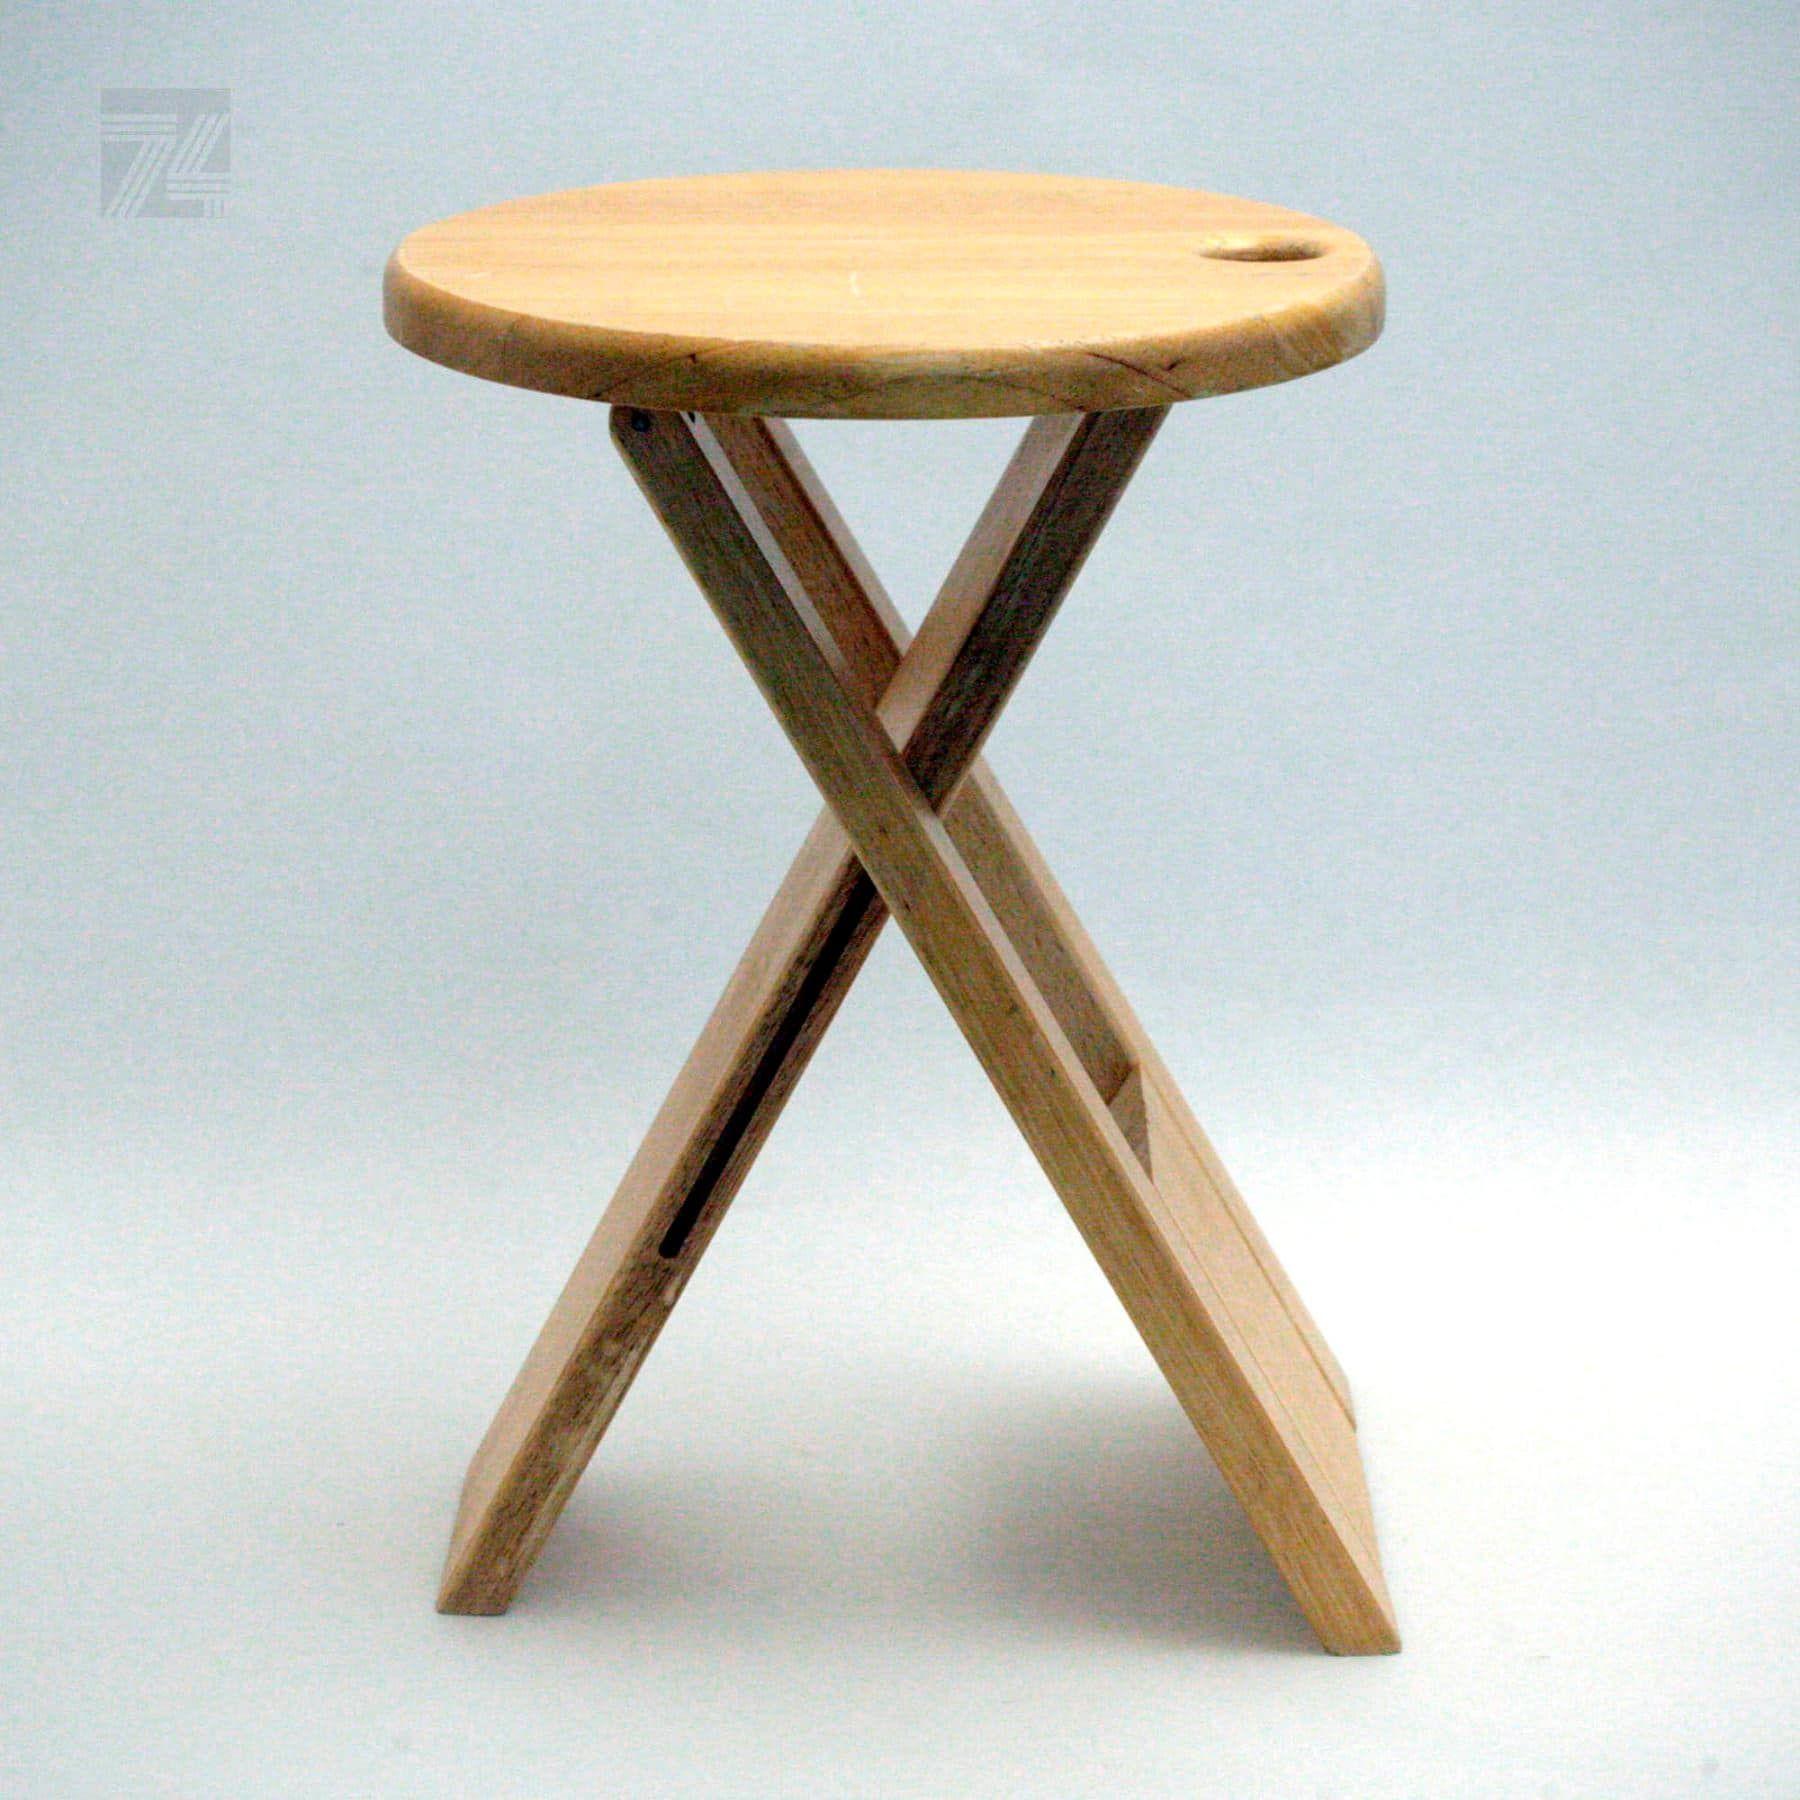 Klapphocker Aus Holz Design Roger Tallon Cyan74 Com Vintage And